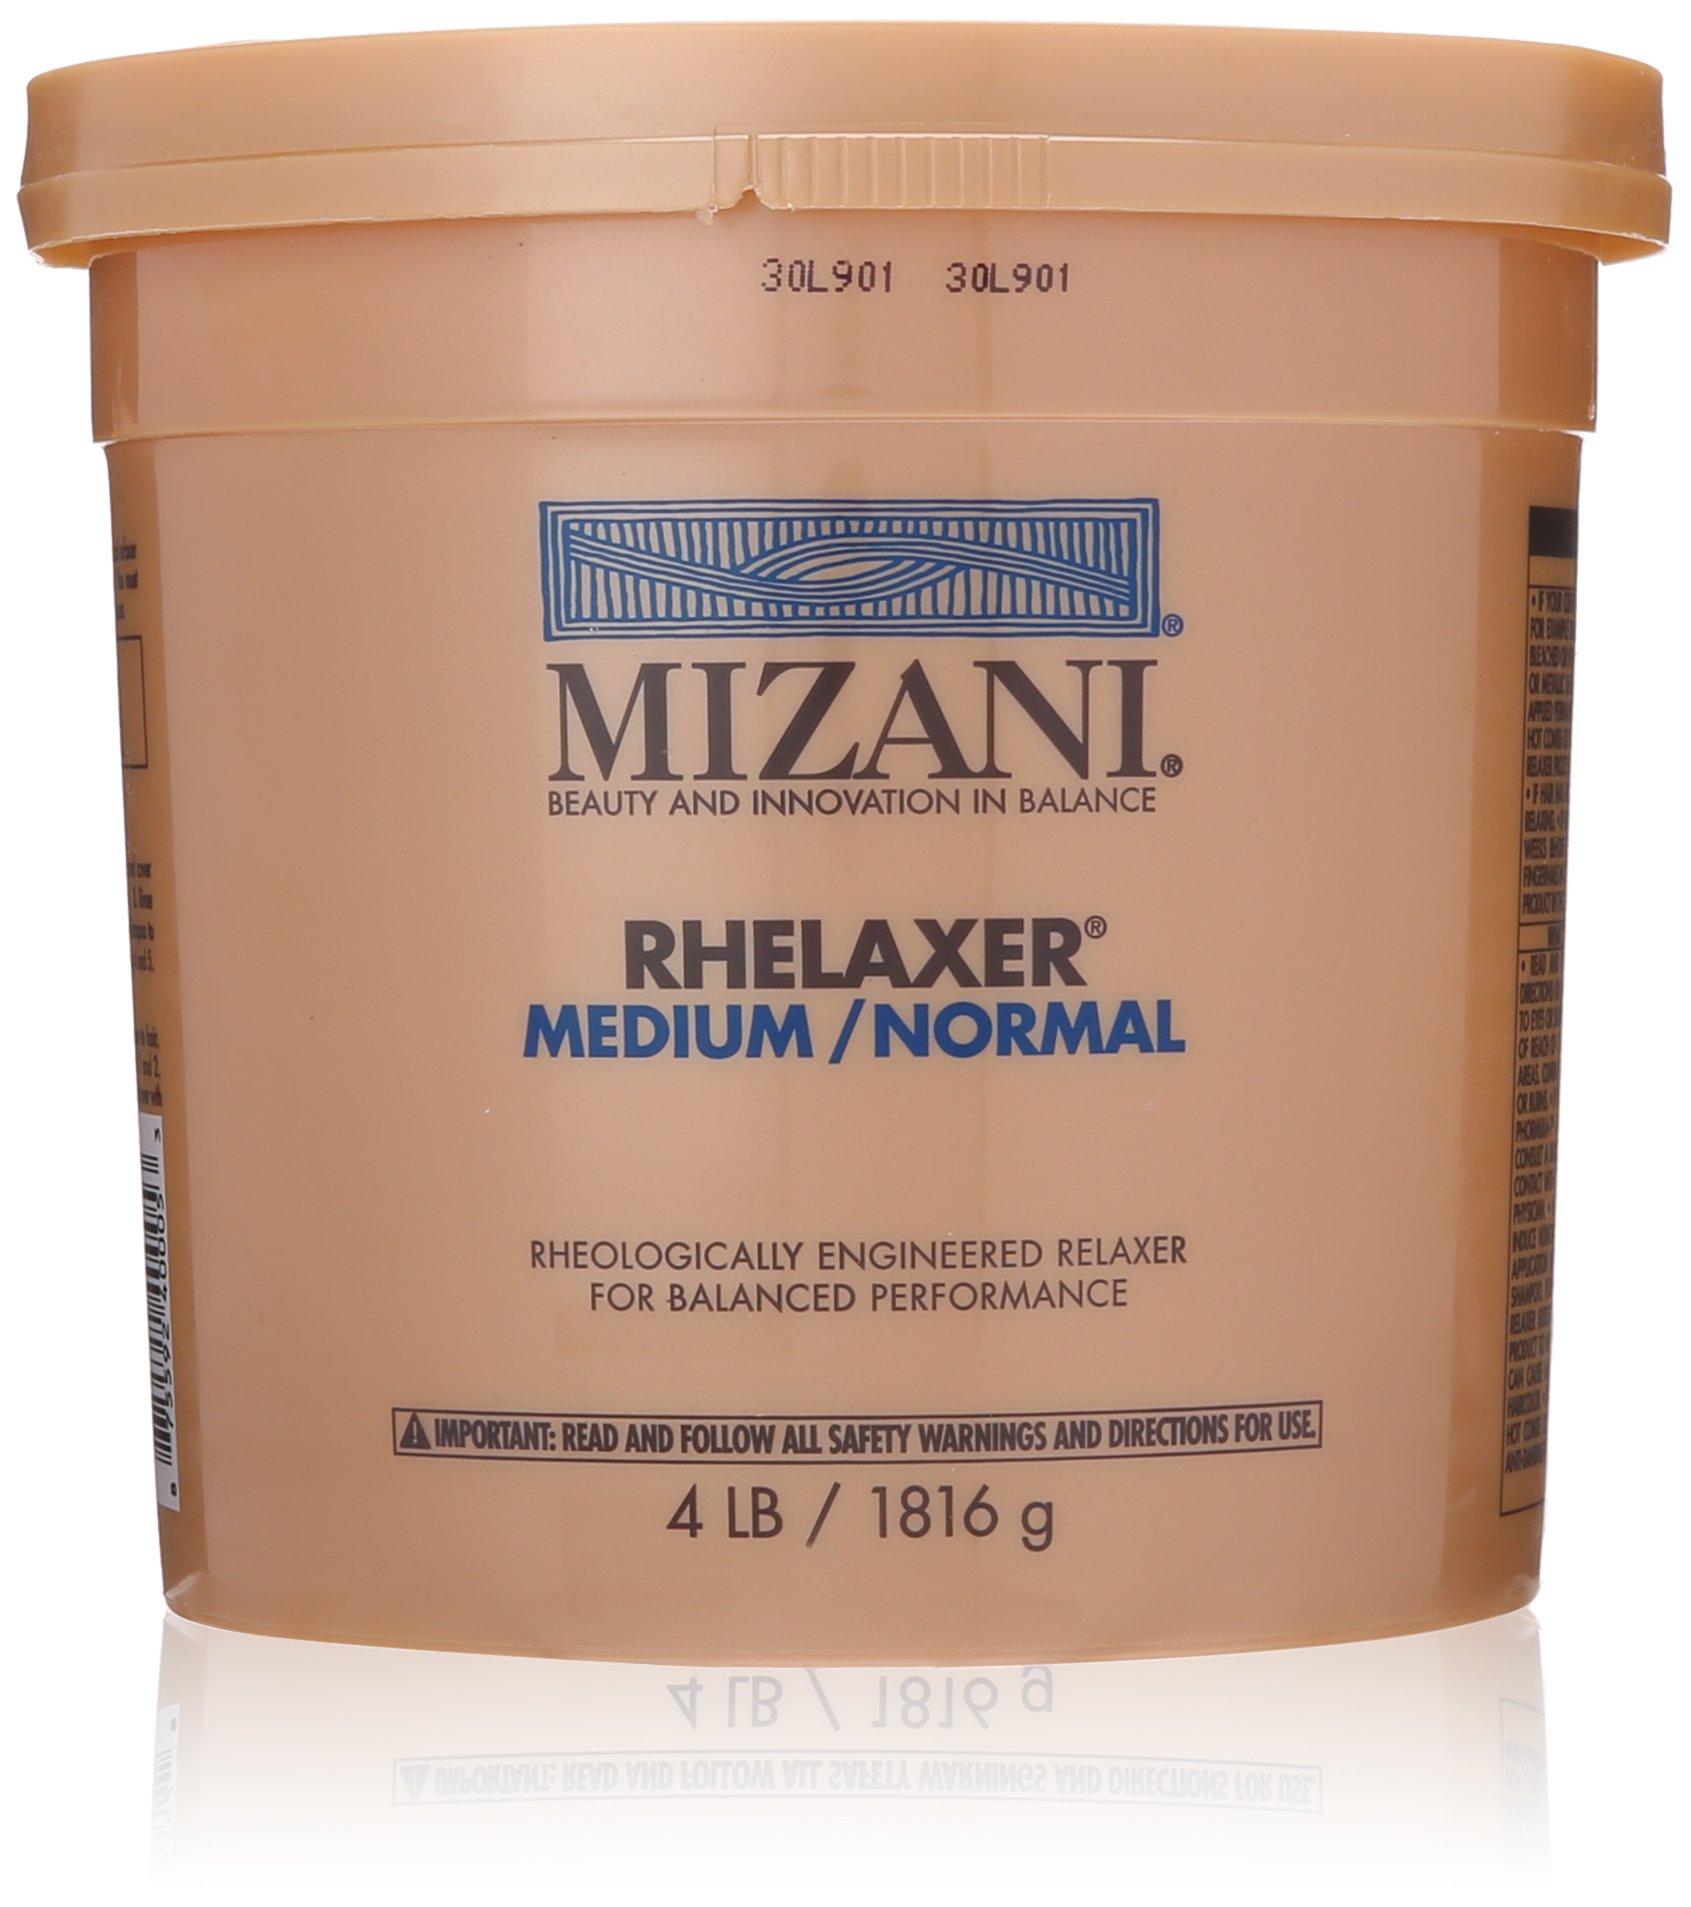 Mizani Rhelaxer for Medium/Normal Hair, 64 Ounce